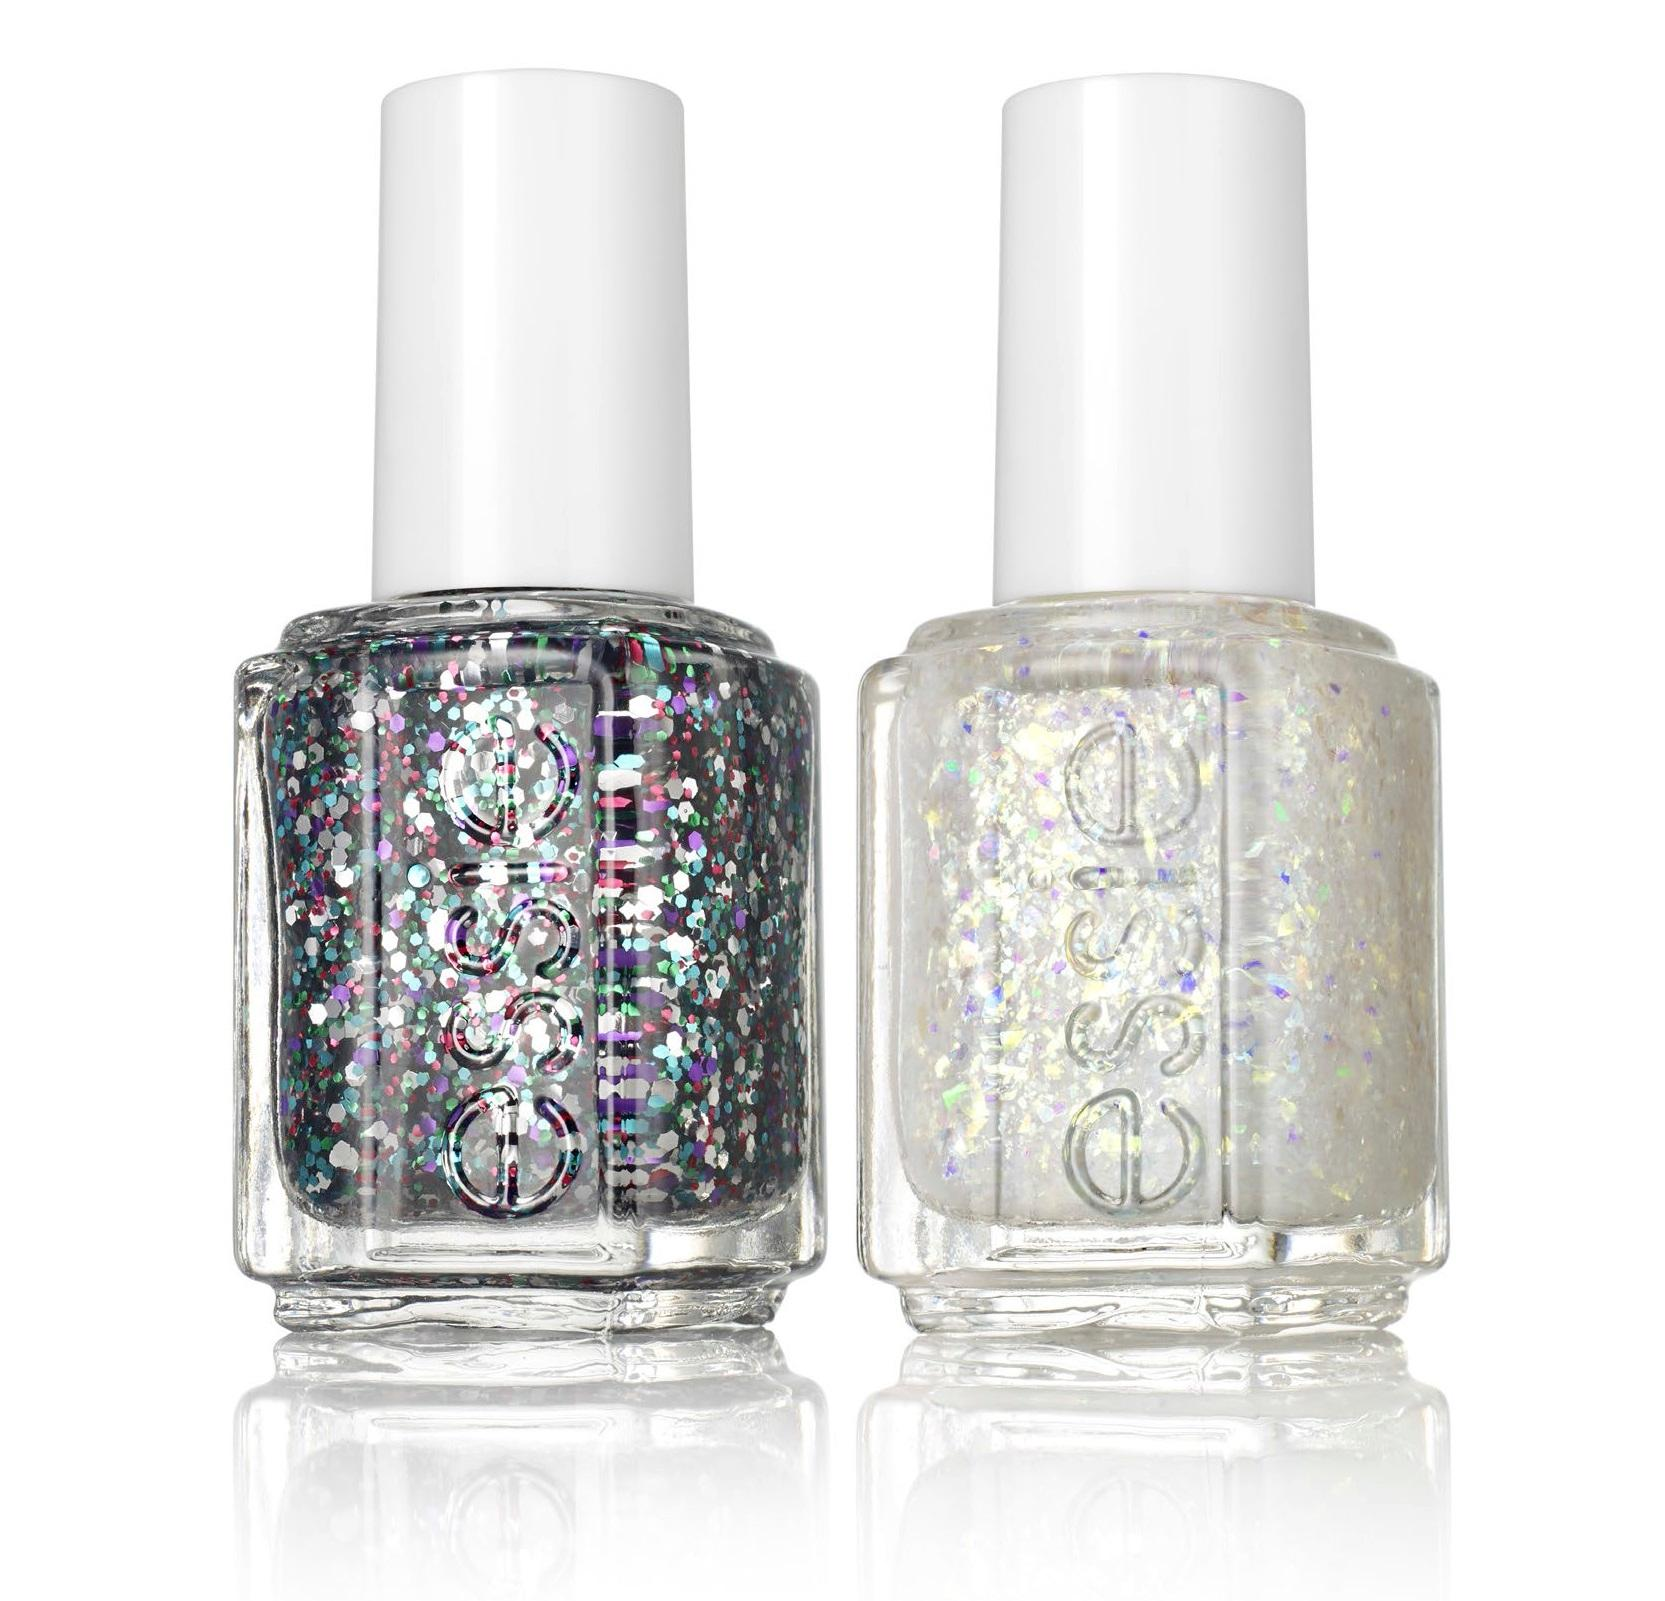 Amazon.com: essie luxeffects nail polish, set in stones, 0.46 fl. oz ...